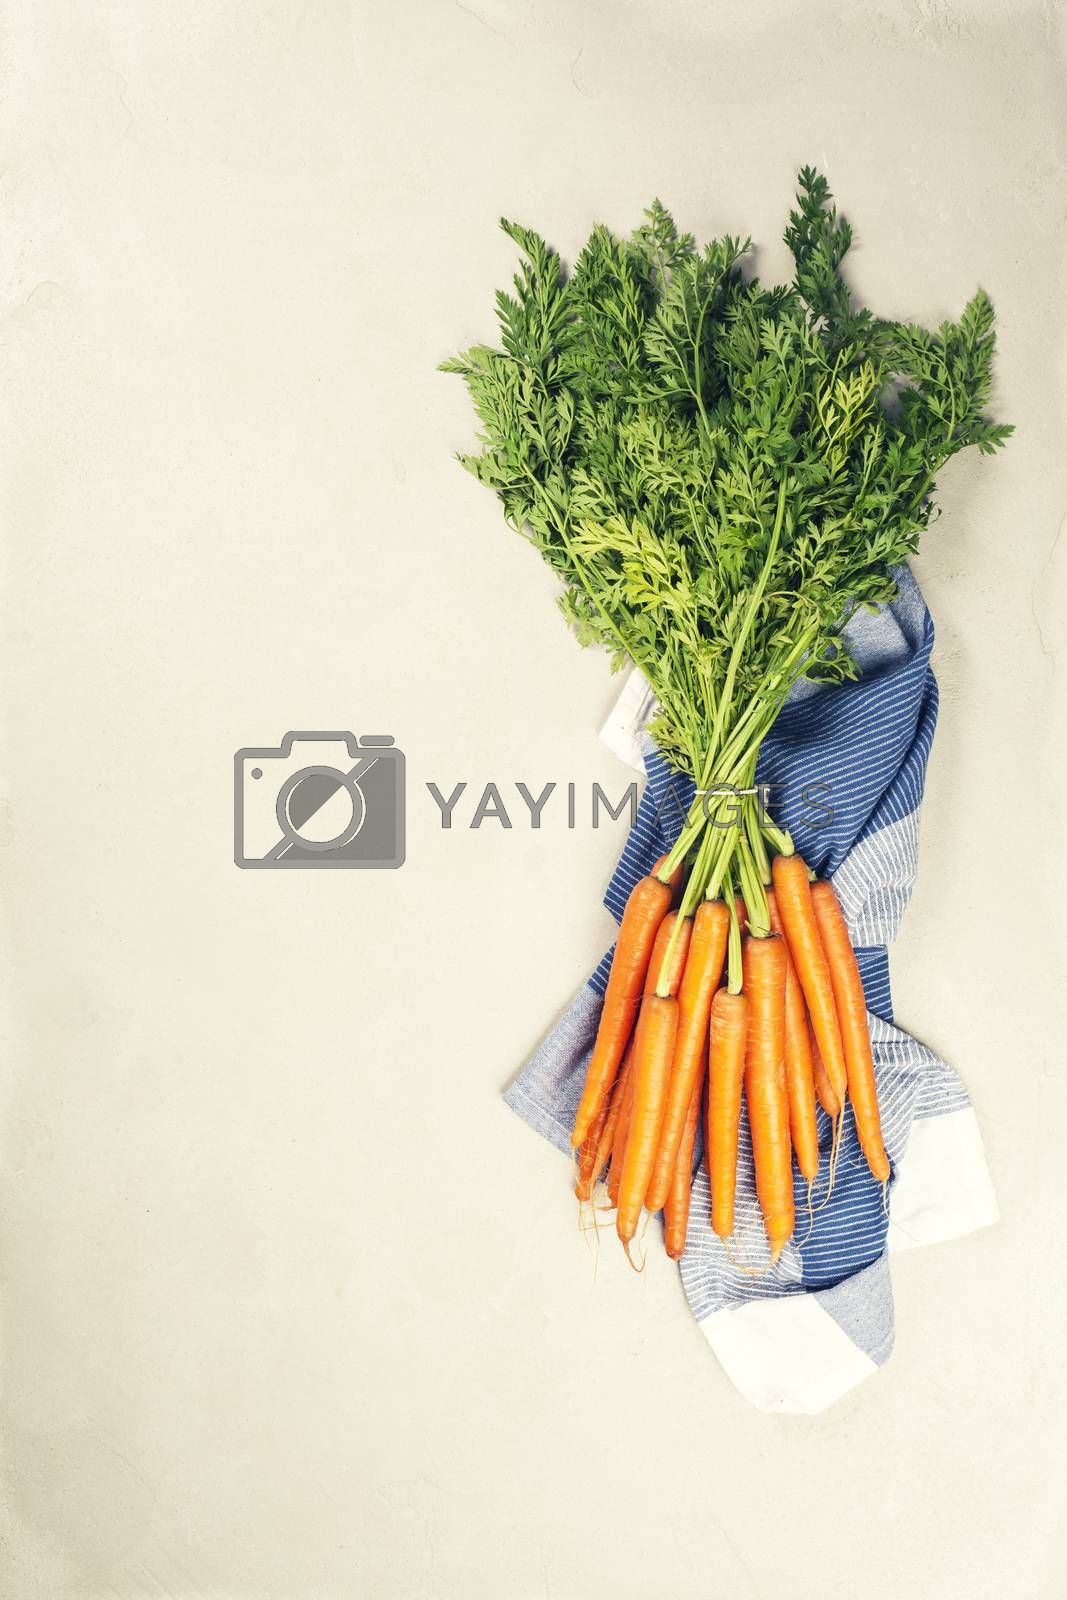 Royalty free image of Fresh Carrots bunch. Raw fresh organic orange carrots. Healthy vegan vegetable food. by klenova